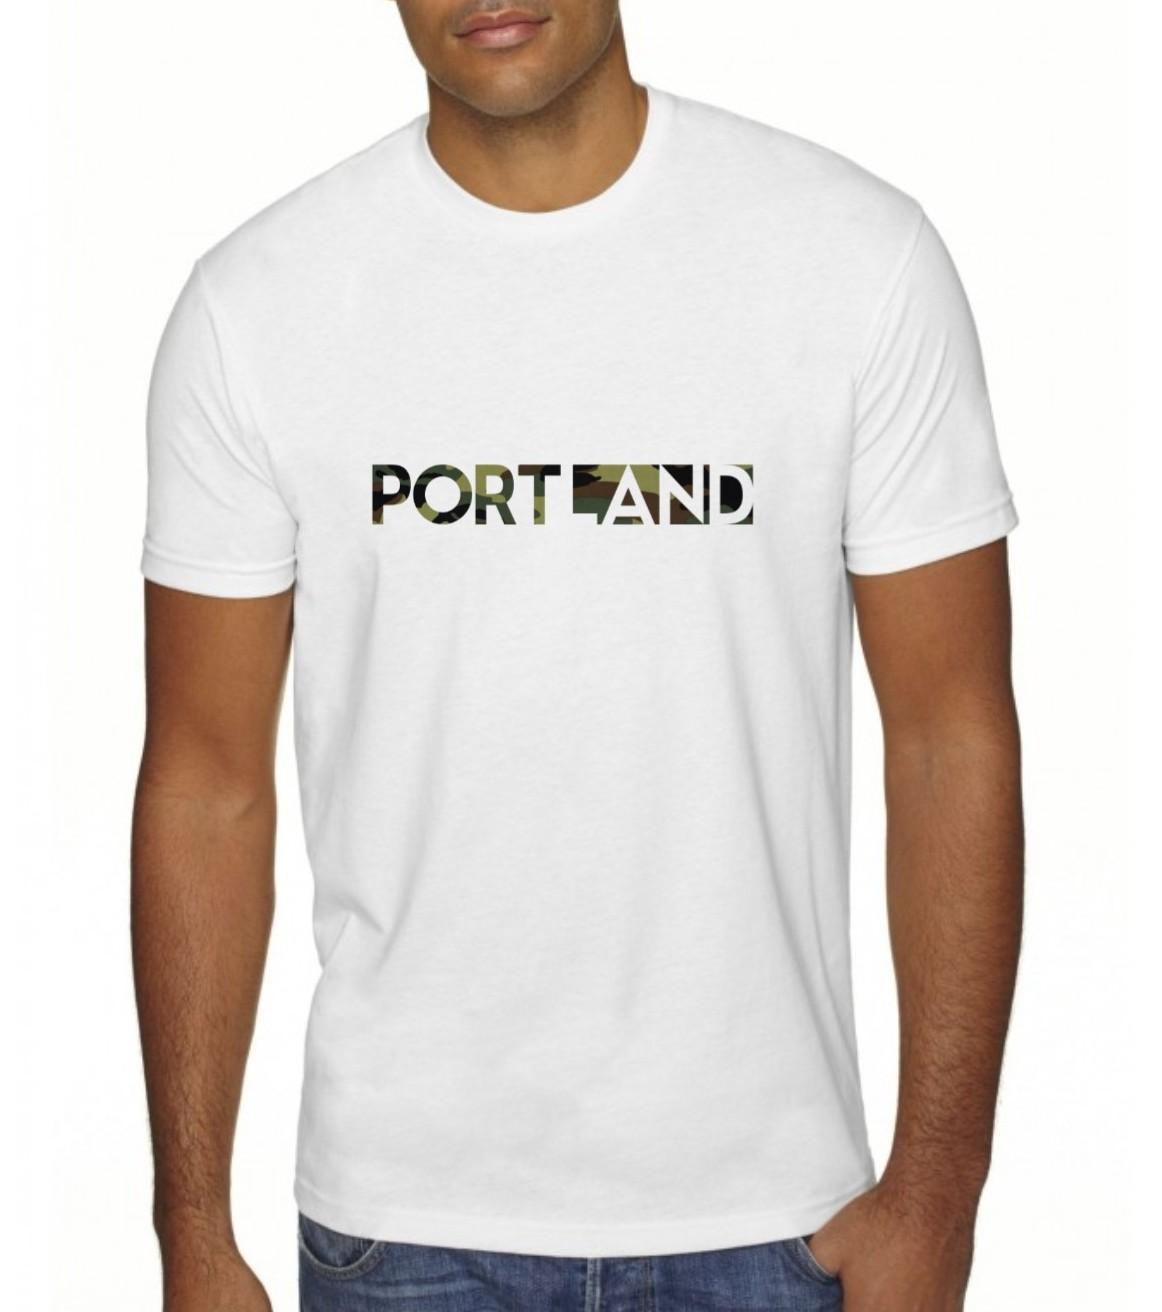 Portland Happening - T Shirt - Camo